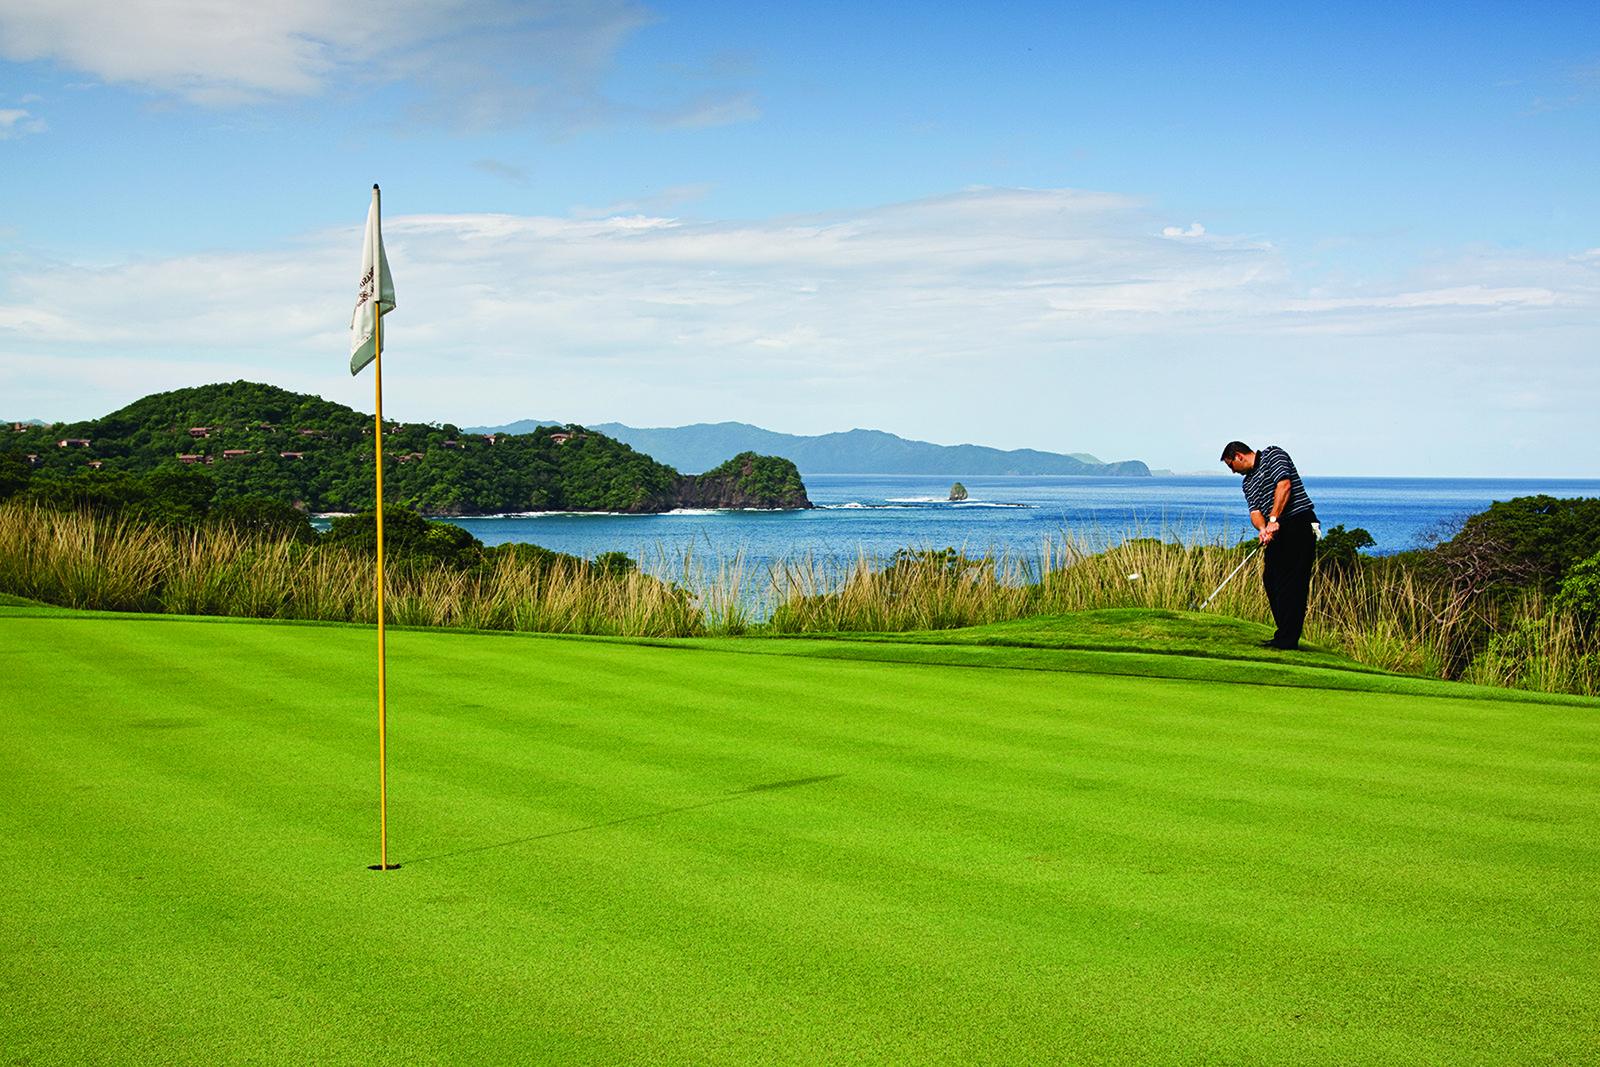 Arnold Palmer Golf Course Four Seasons Papagayo Peninsula Photo Credit: Dana Klein